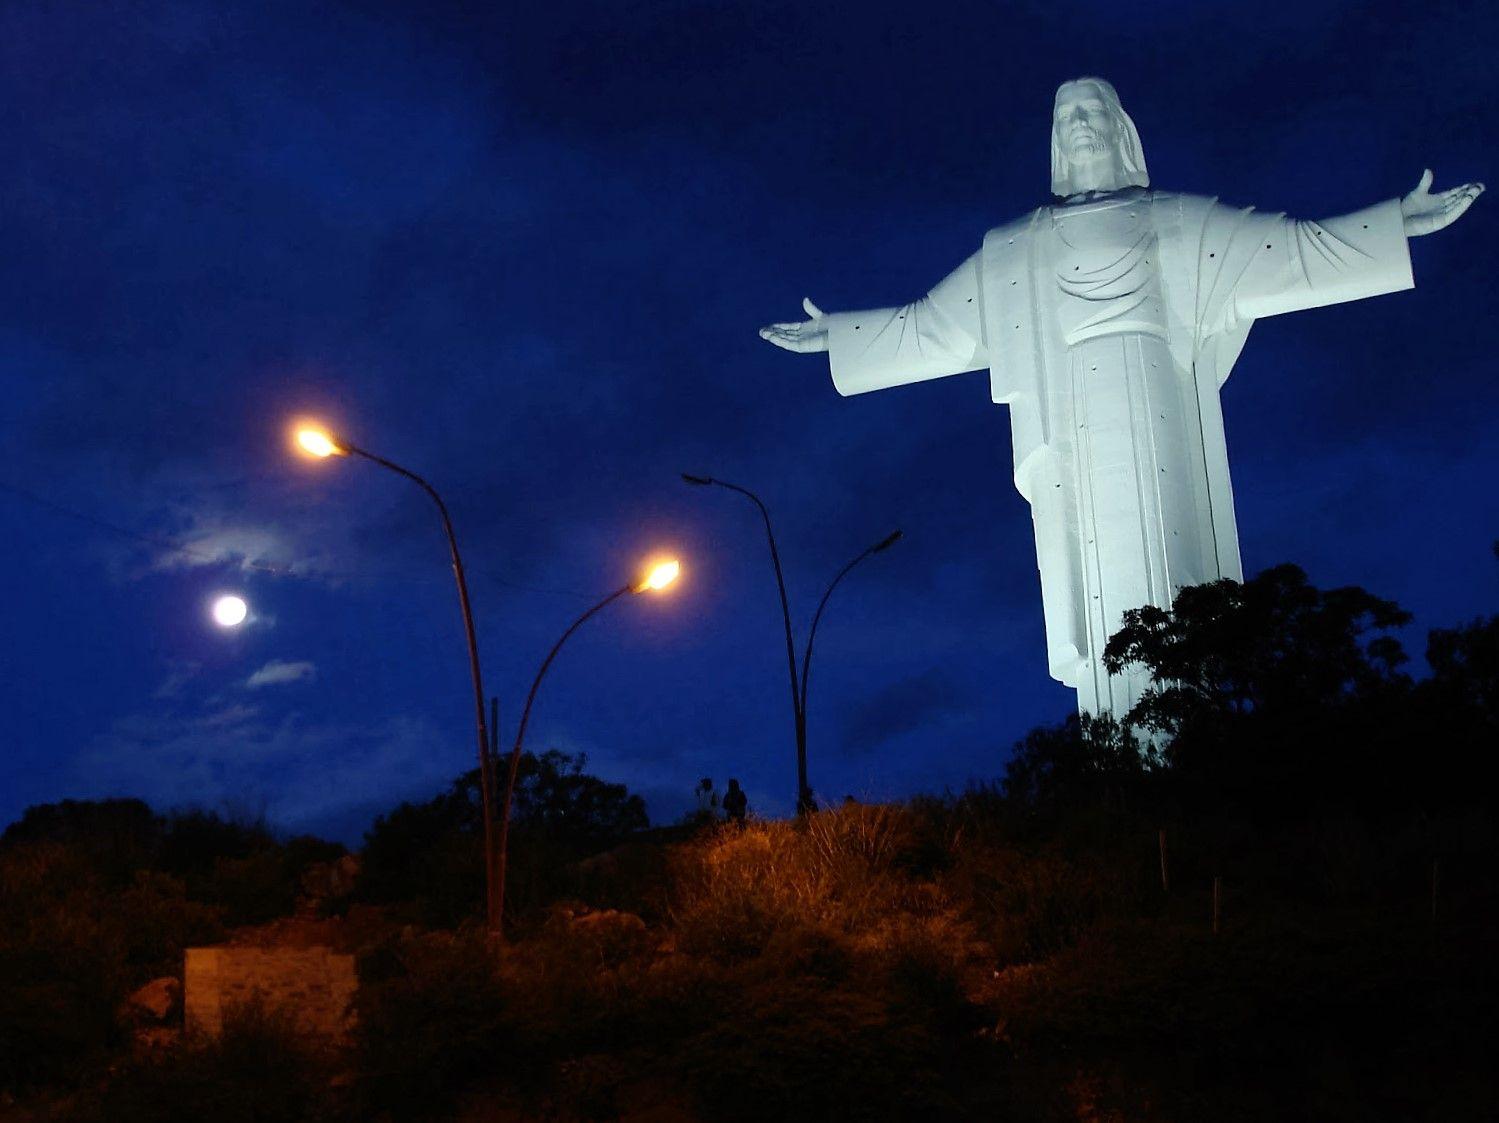 Cristo De La Concordia Cochabamba Bolivia Cristo Paisajes De Bolivia Bolivia